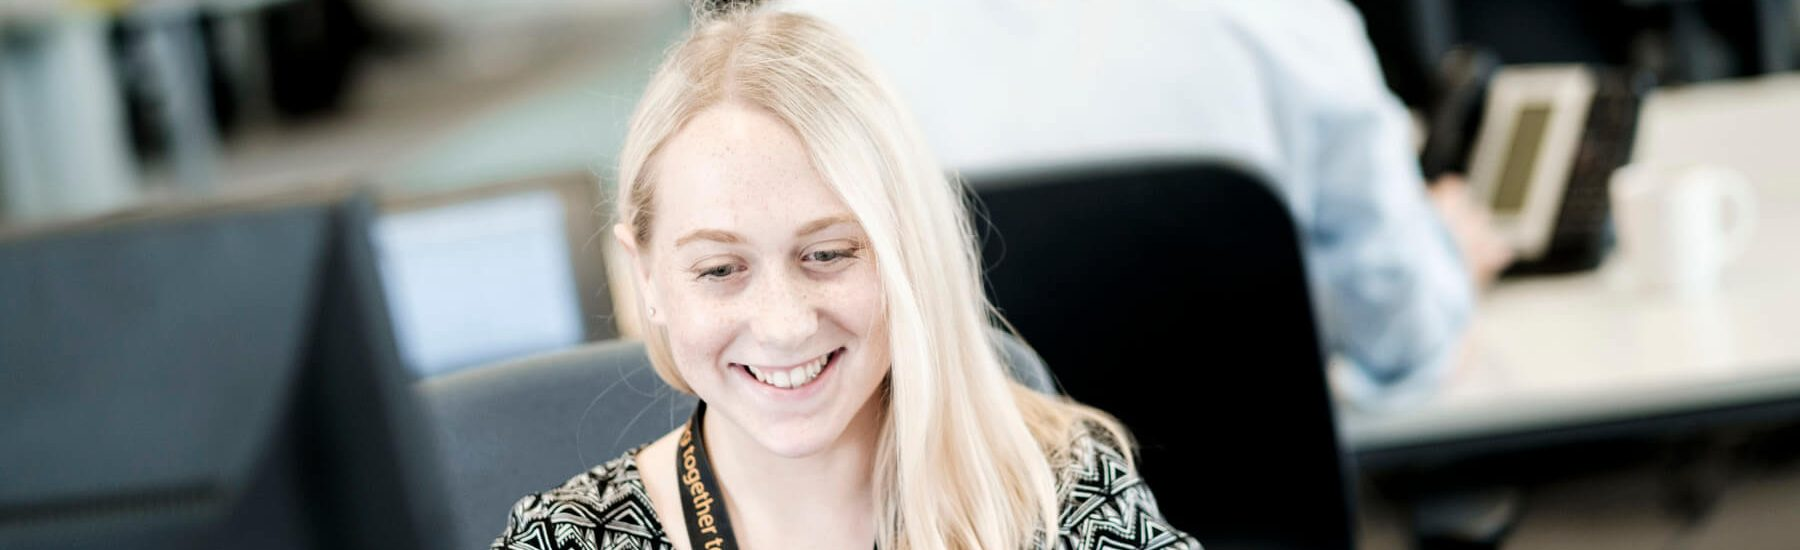 skills hub help 1800x550 - How the Cornwall & Isles of Scilly Skills Hub can help